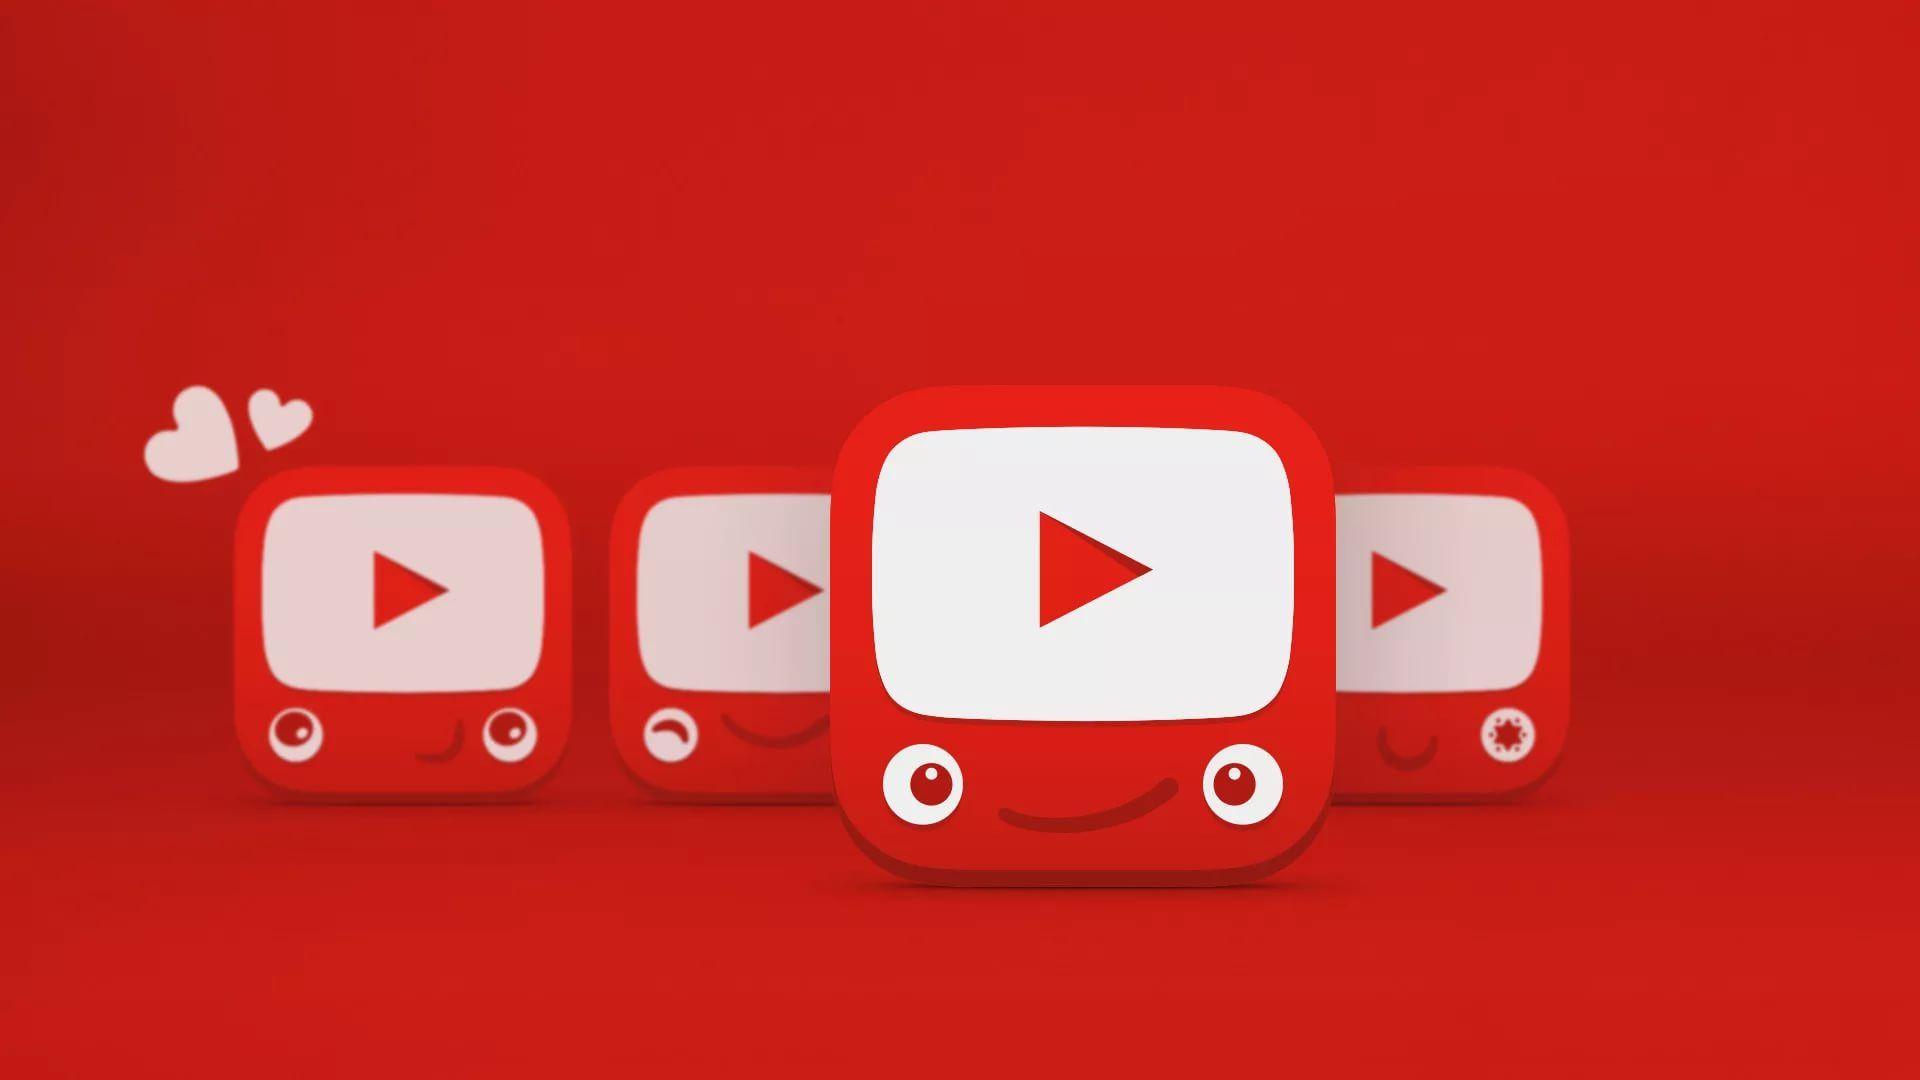 Youtube Cool HD Wallpaper